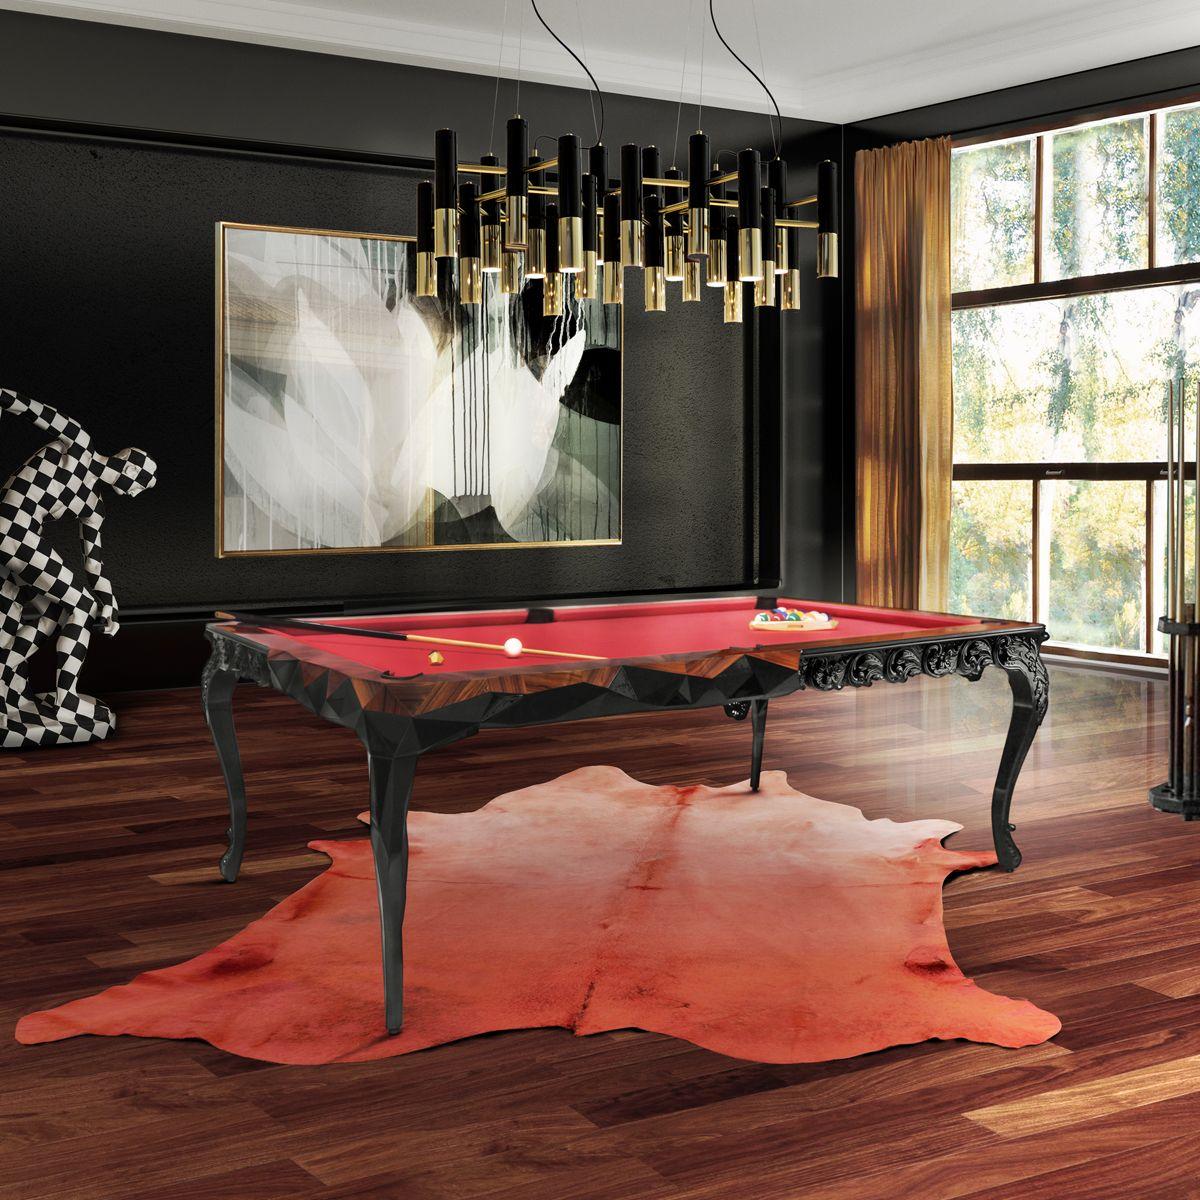 Royal Snooker Table by Boca do Lobo